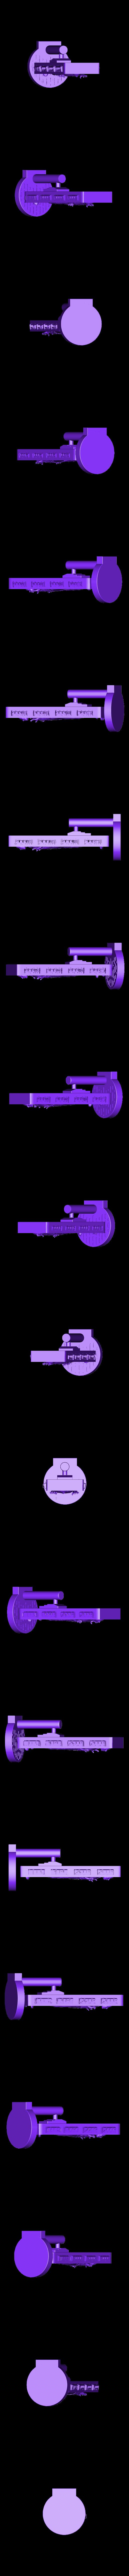 HanSolo_Carbonite_all.stl Download free STL file Han Solo in Carbonite • 3D printing model, ian57